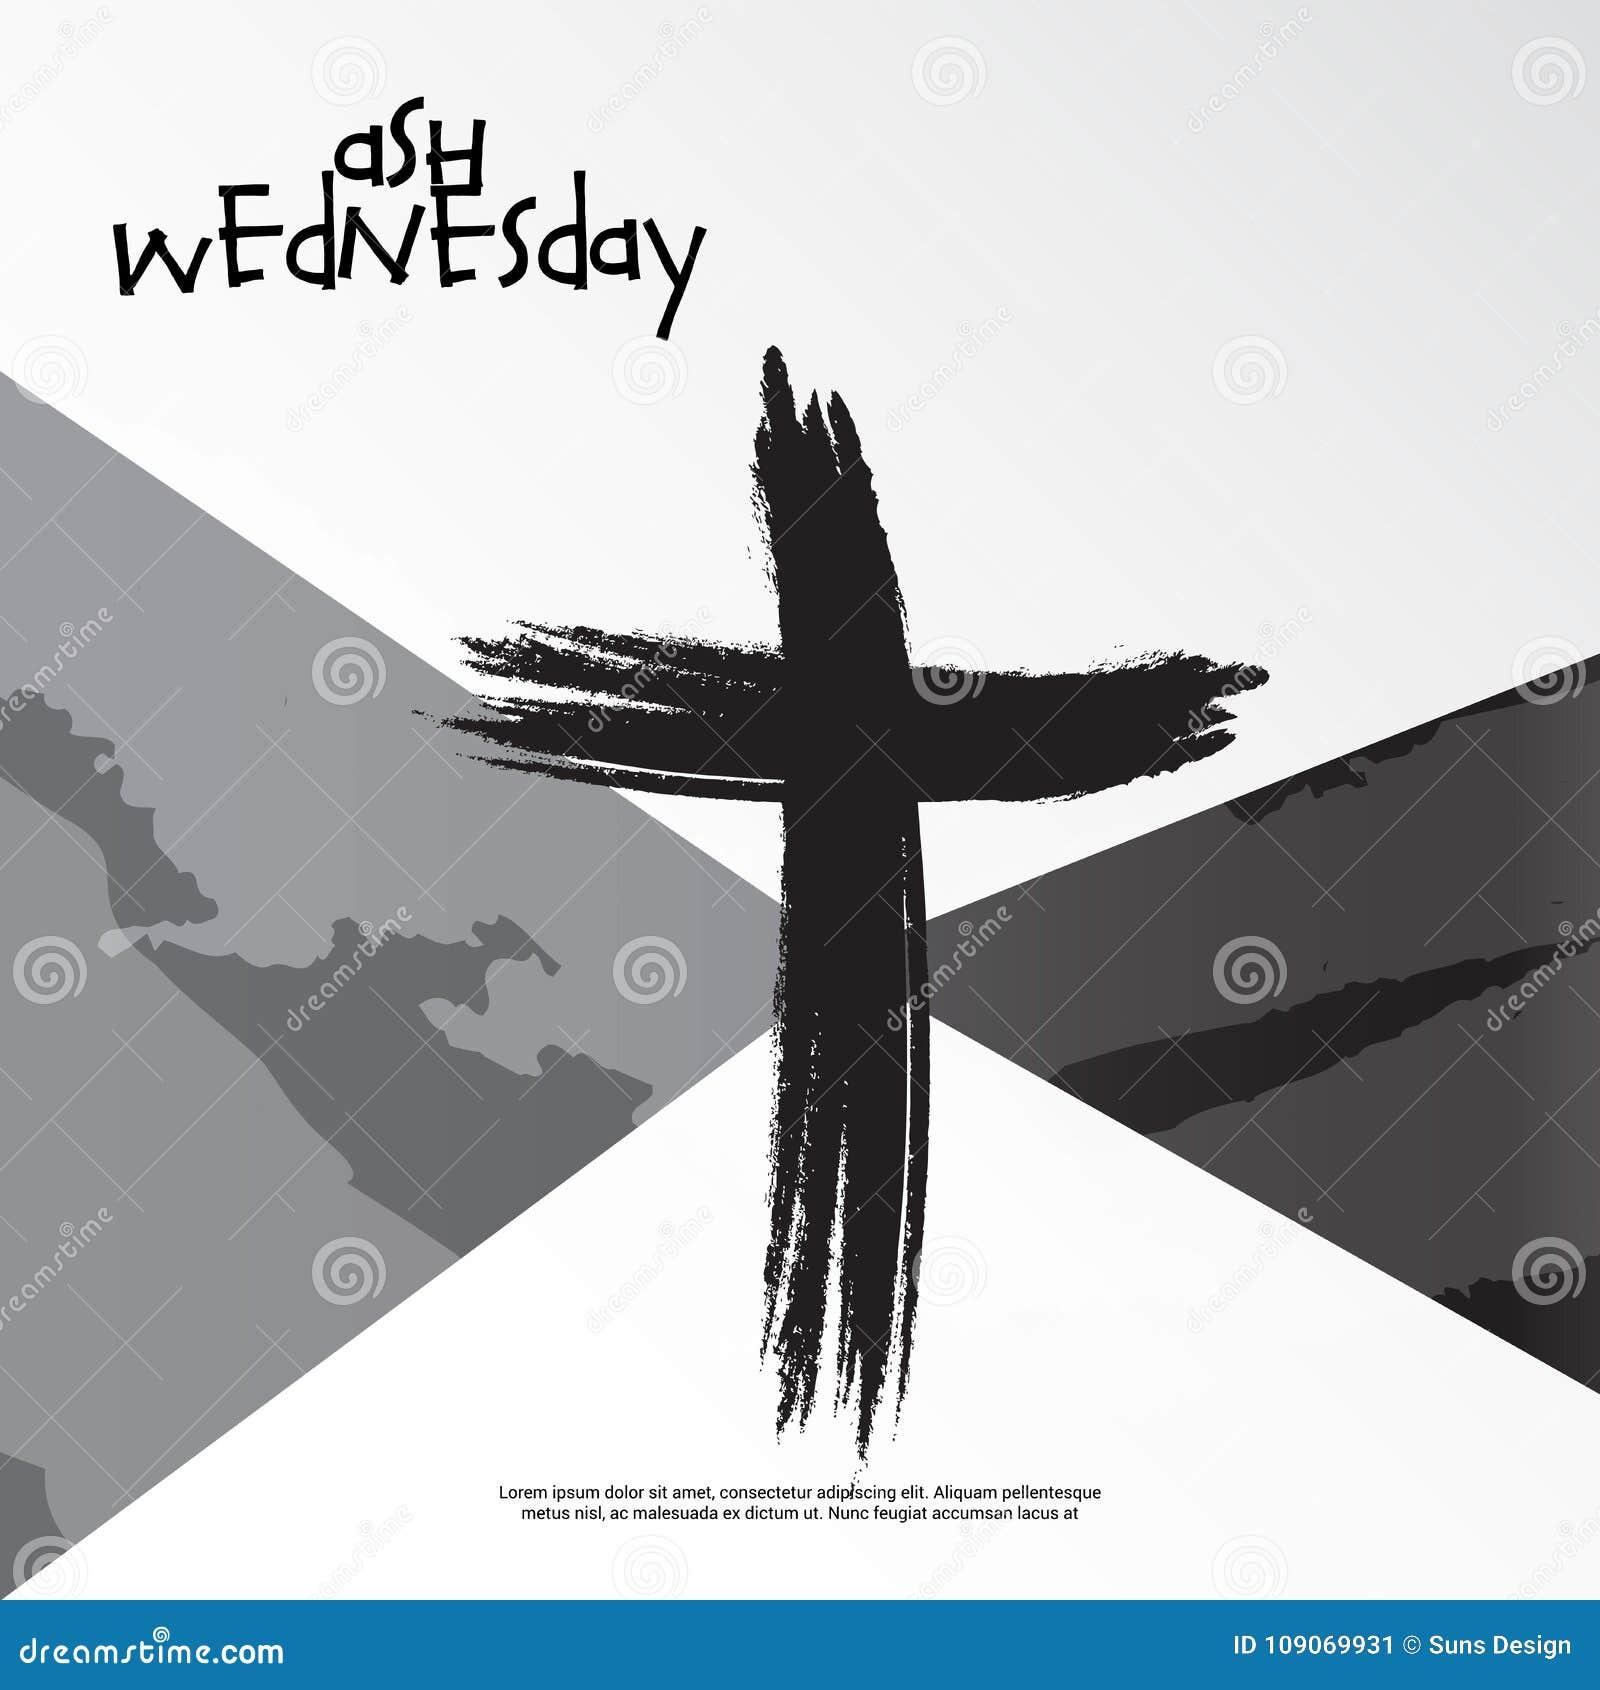 Ash wednesday stock illustration illustration of divine 109069931 ash wednesday divine christian buycottarizona Image collections